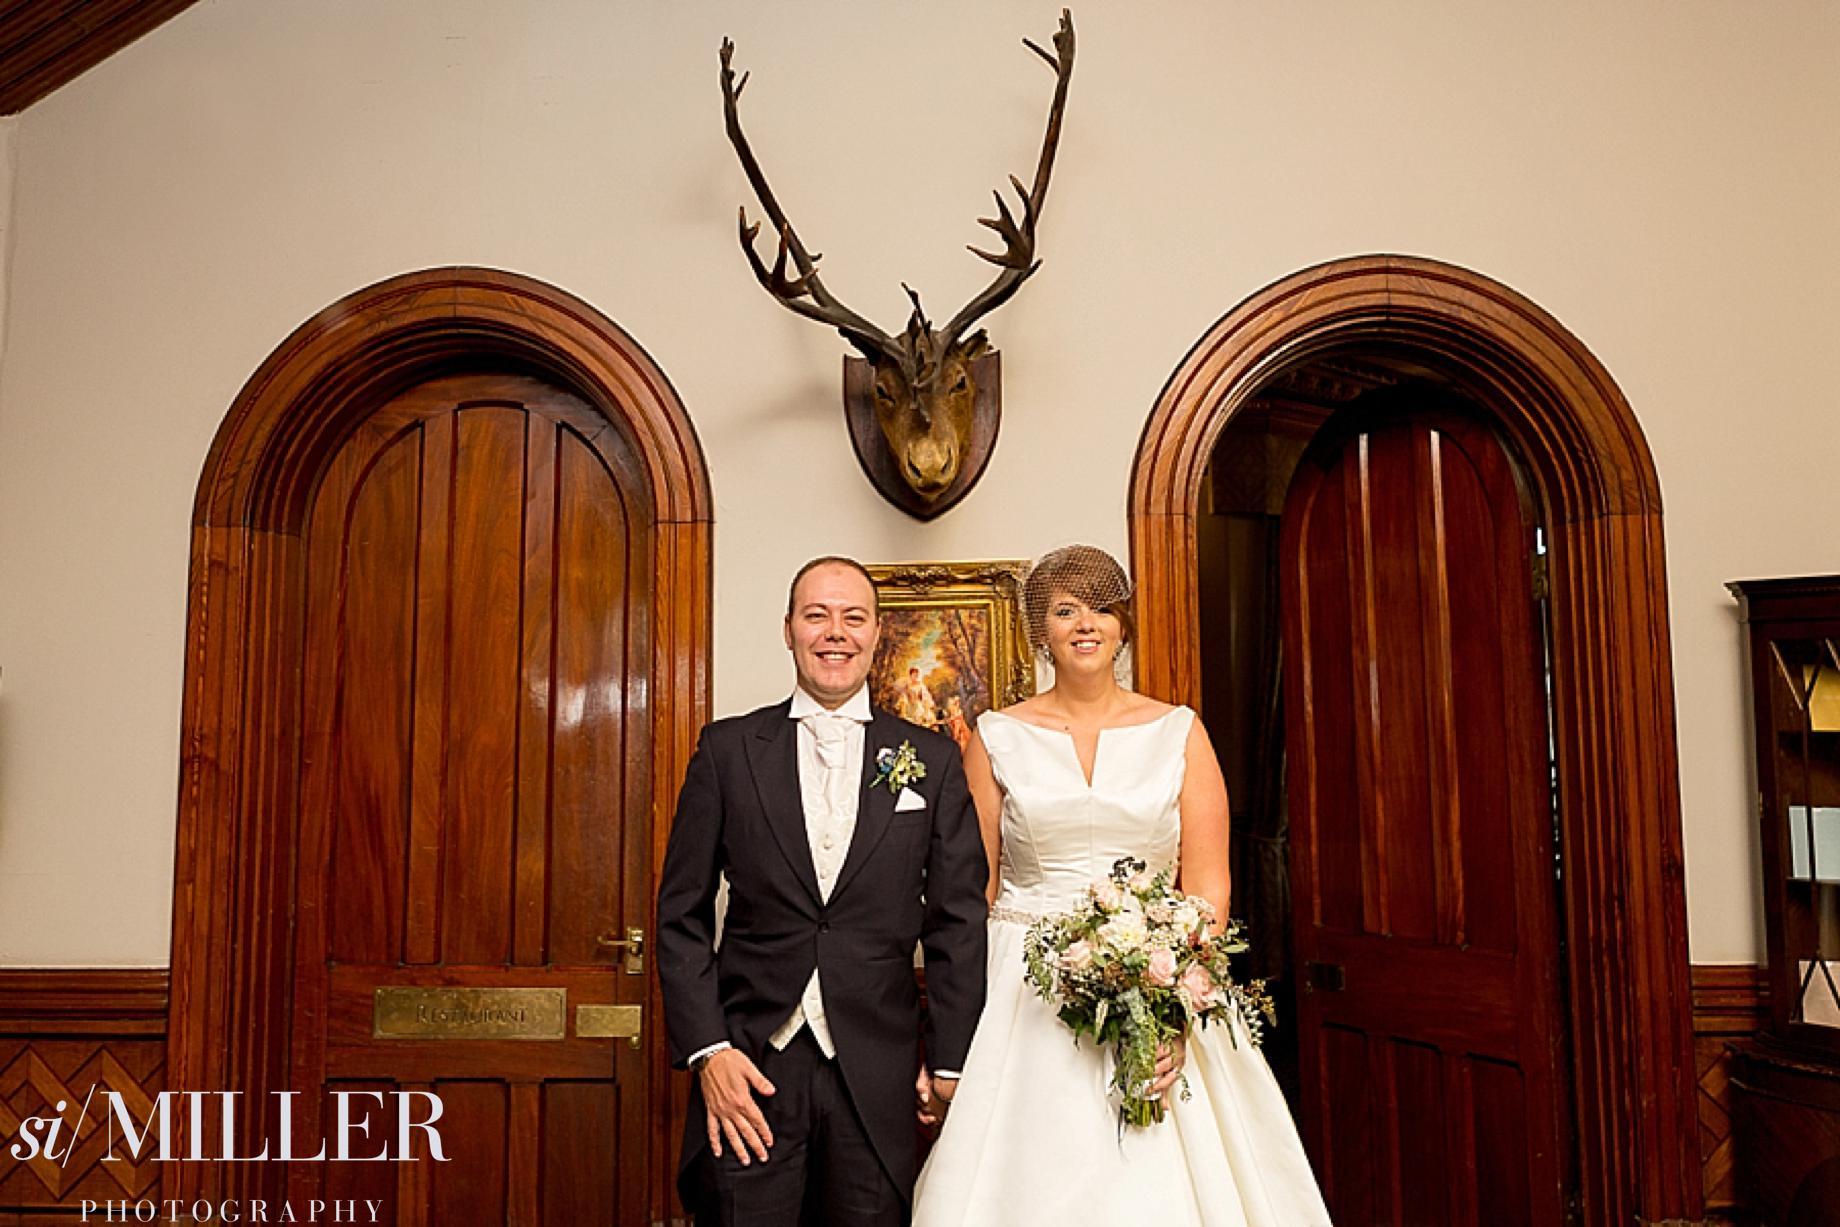 Kilhey Court Wedding Photographer Wigan Lancashire